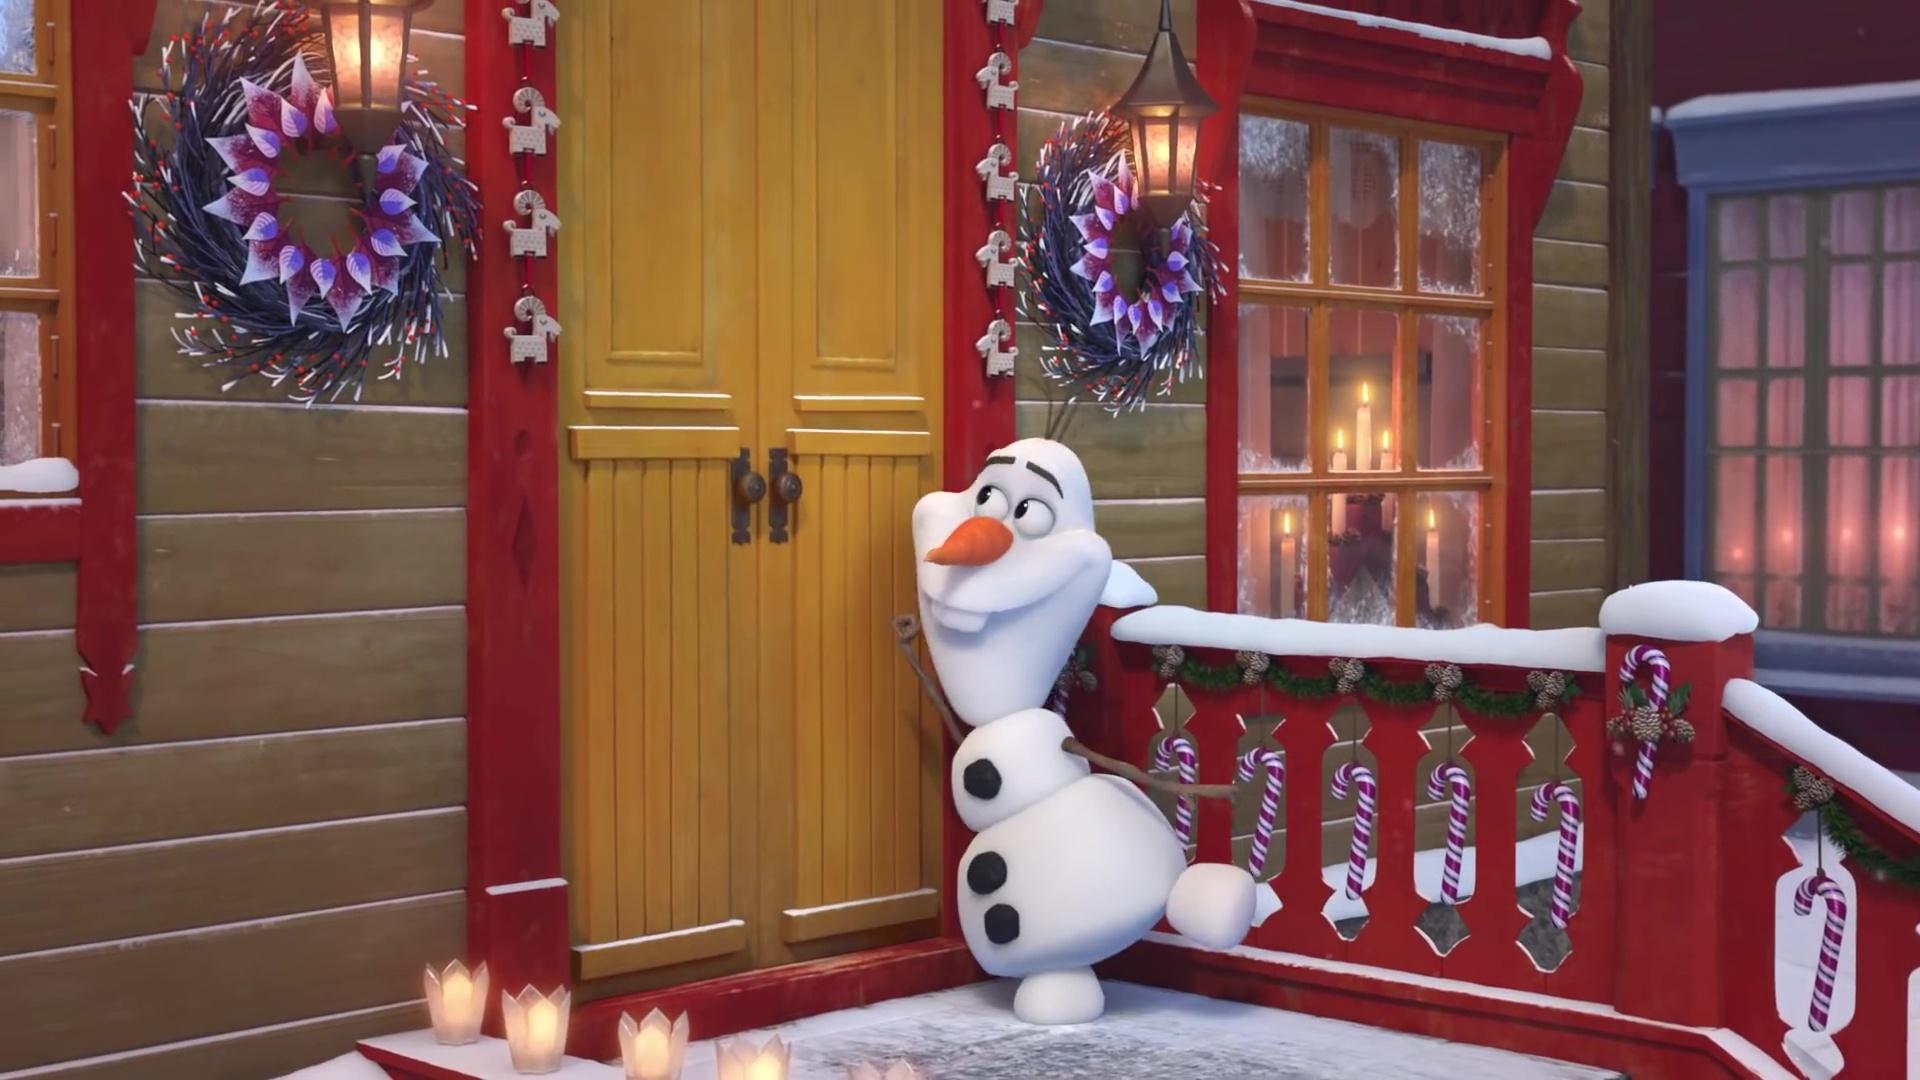 capture reine neige joyeuse fete olaf frozen adventure disney